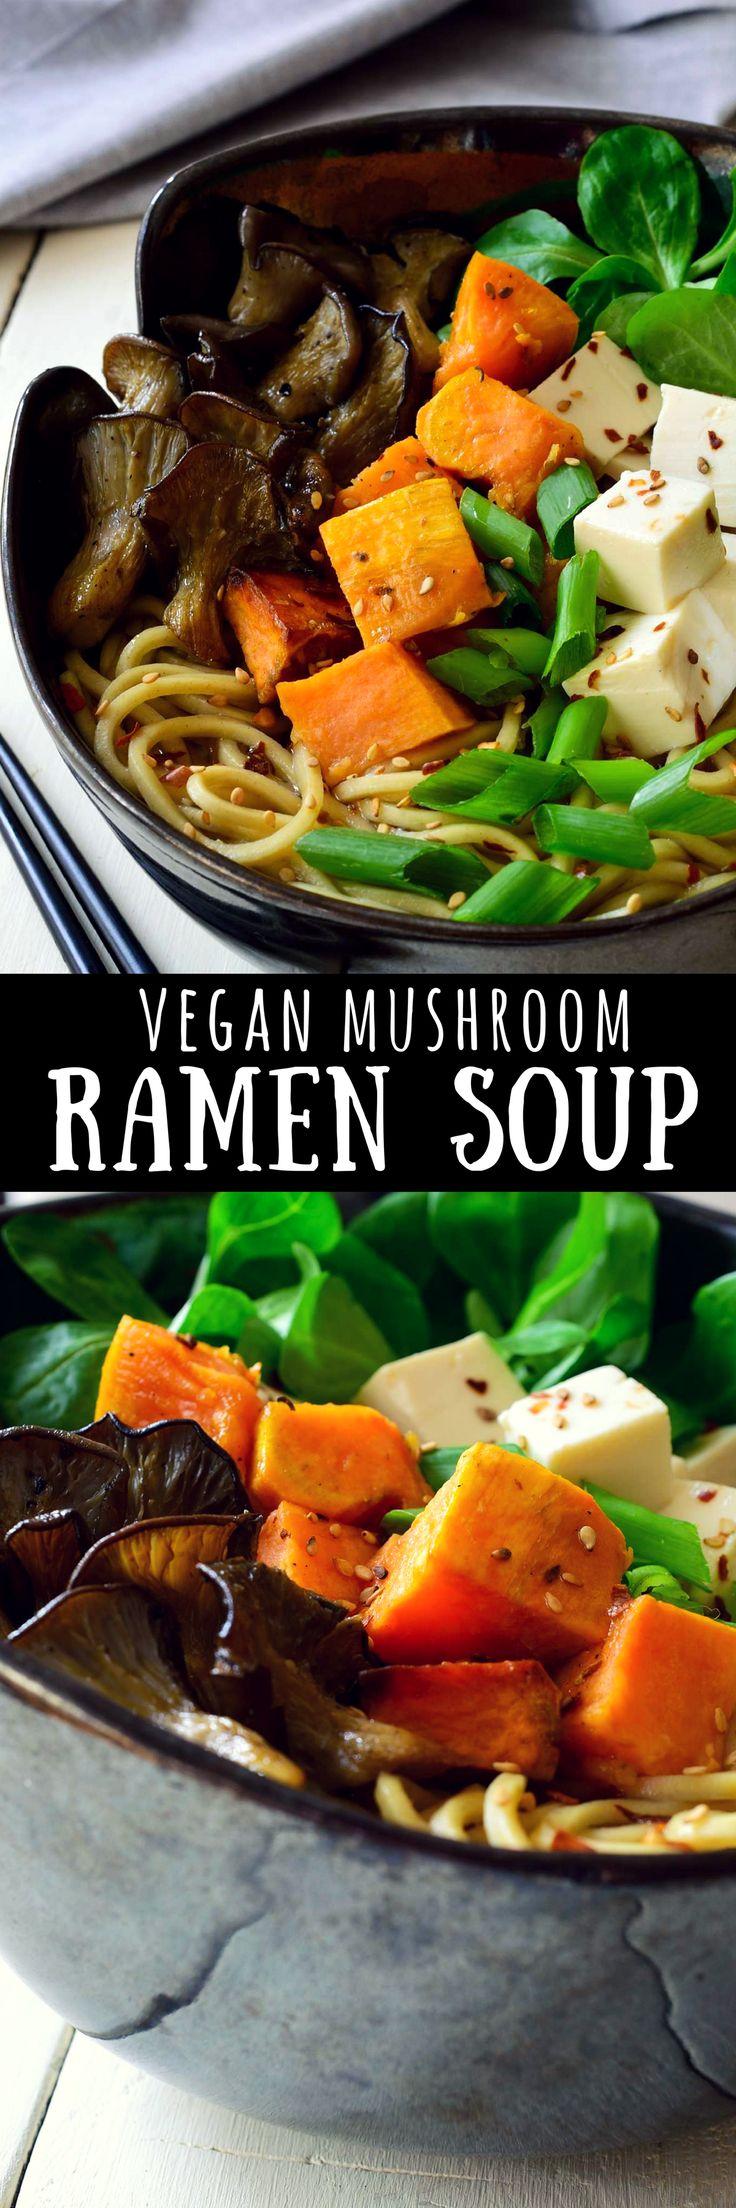 vegan mushroom ramen soup rezept koch mama und kreativ. Black Bedroom Furniture Sets. Home Design Ideas